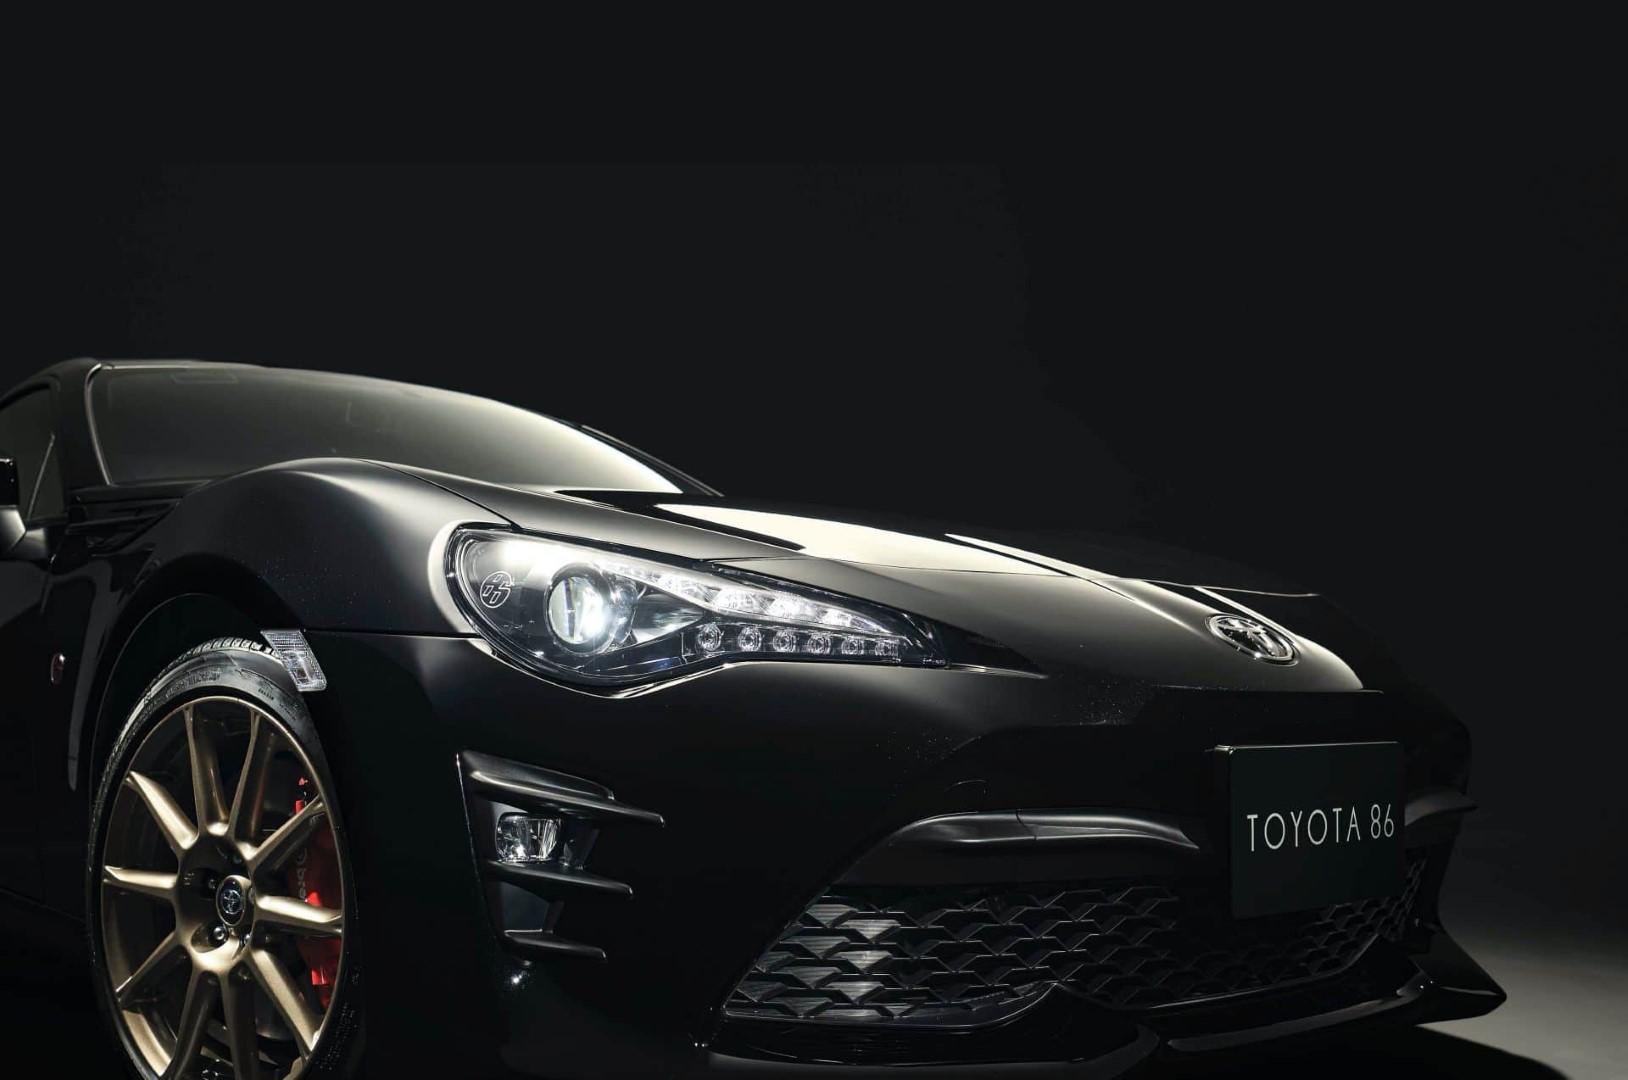 Série limitée: Toyota GT86 Black Limited